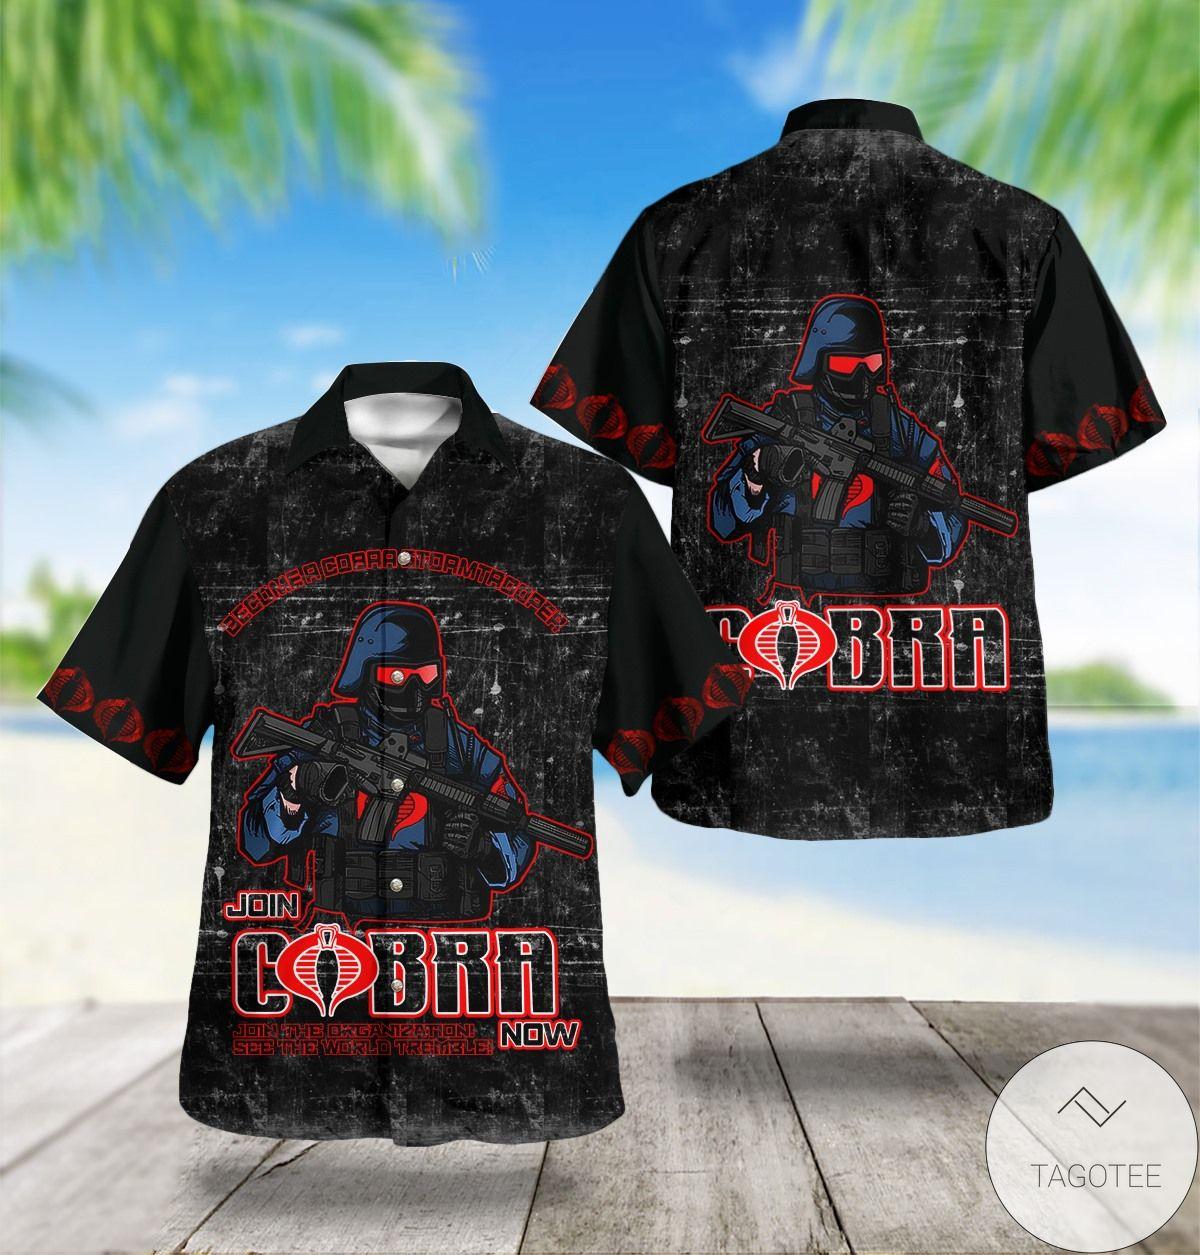 Join Cobra Join The Organization See The World Tremble Now Hawaiian Shirt